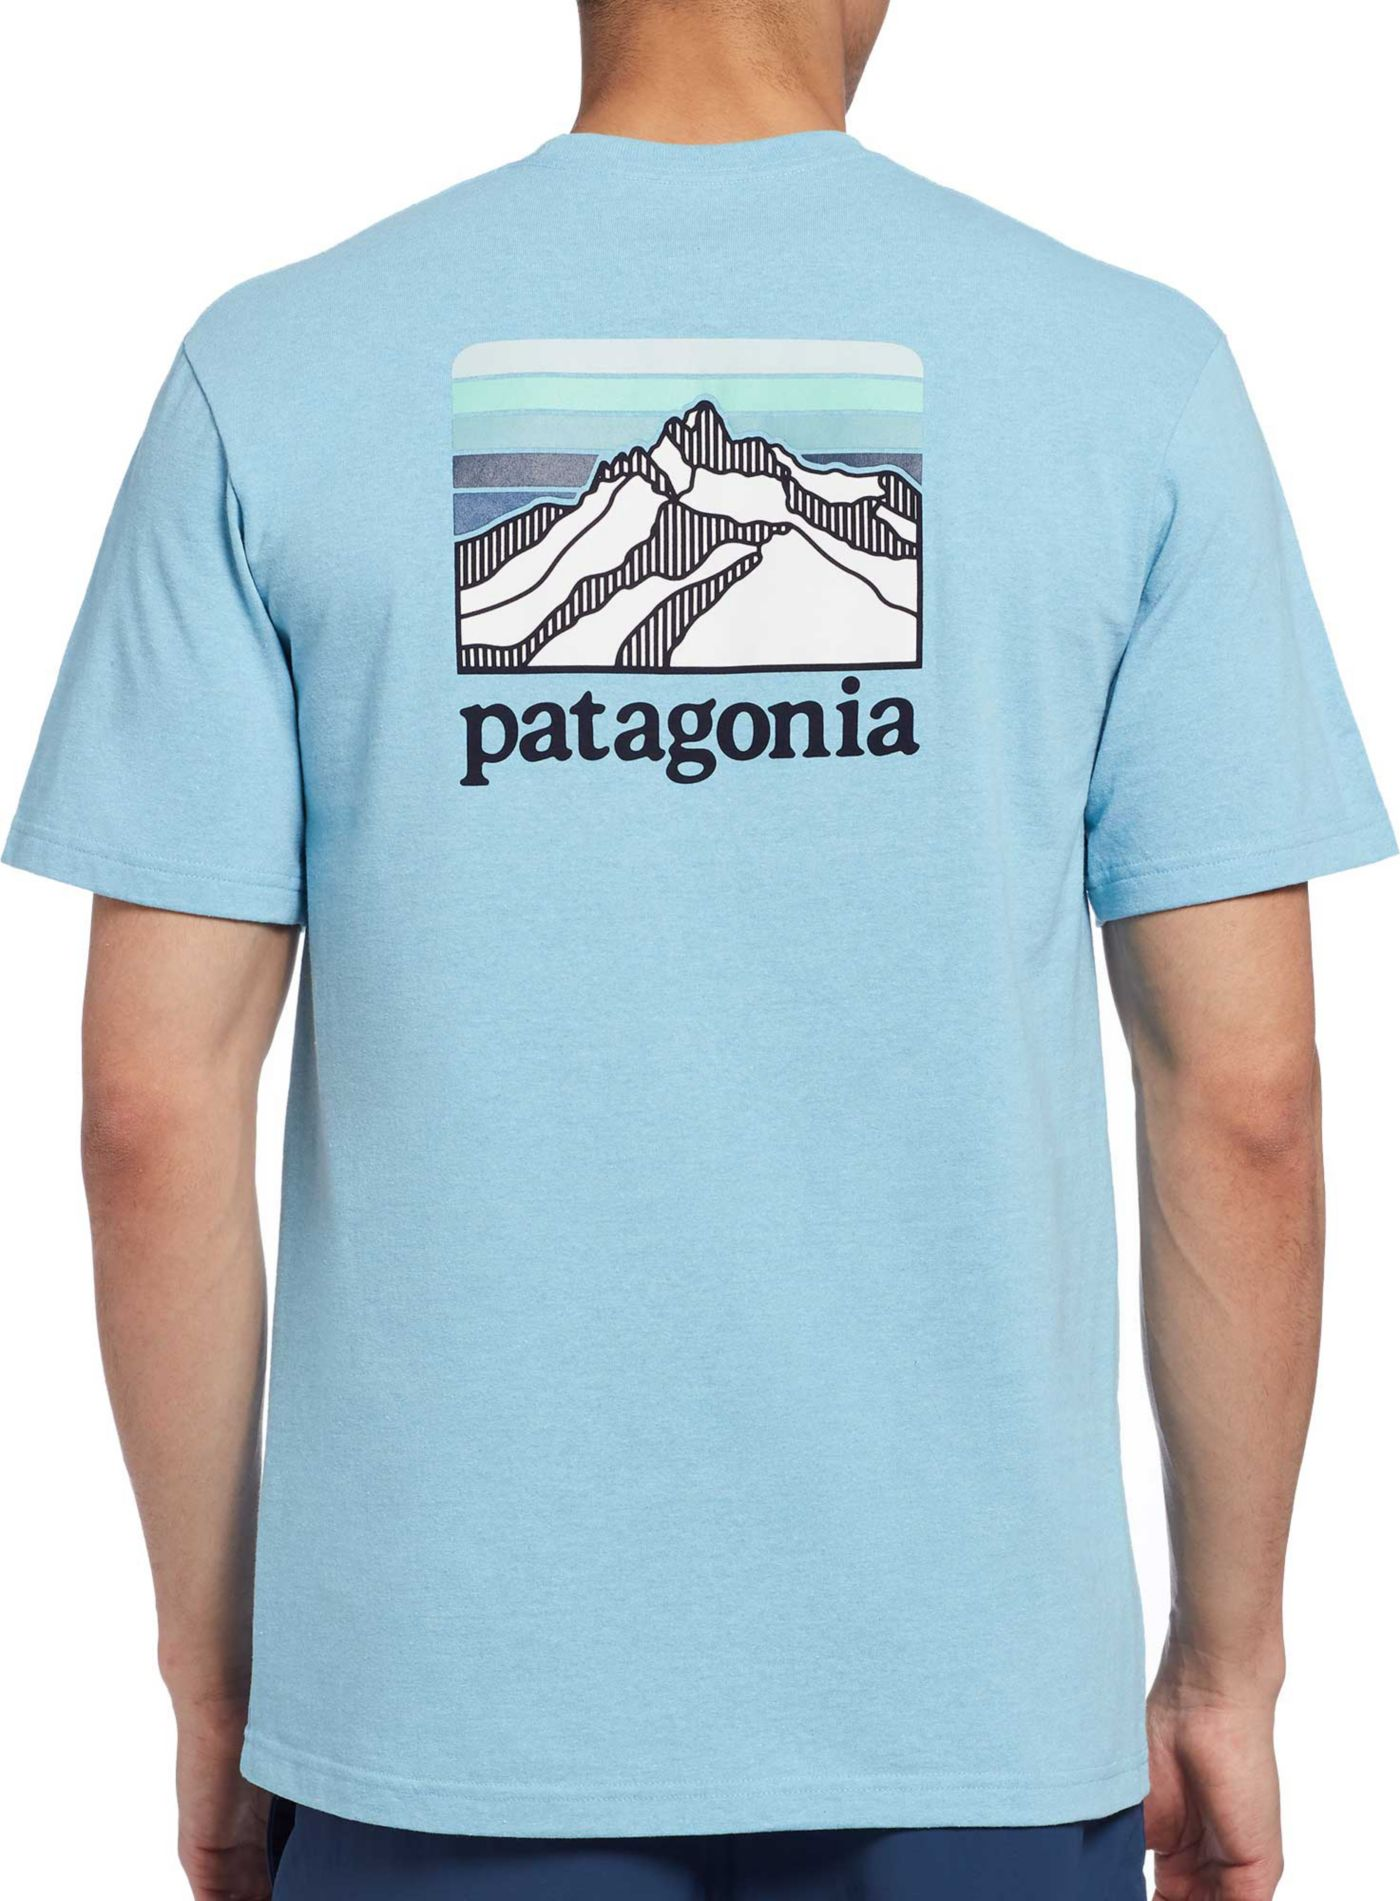 Patagonia Men's Line Logo Ridge Pocket Responsibili-Tee T-Shirt